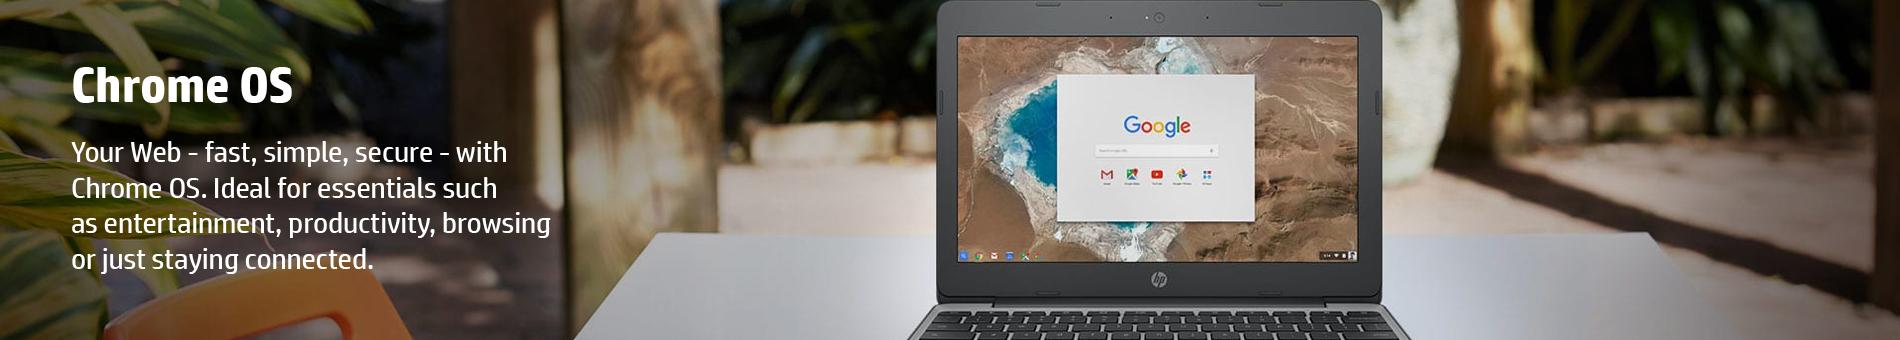 Hp Chromebook General Sale Tile1